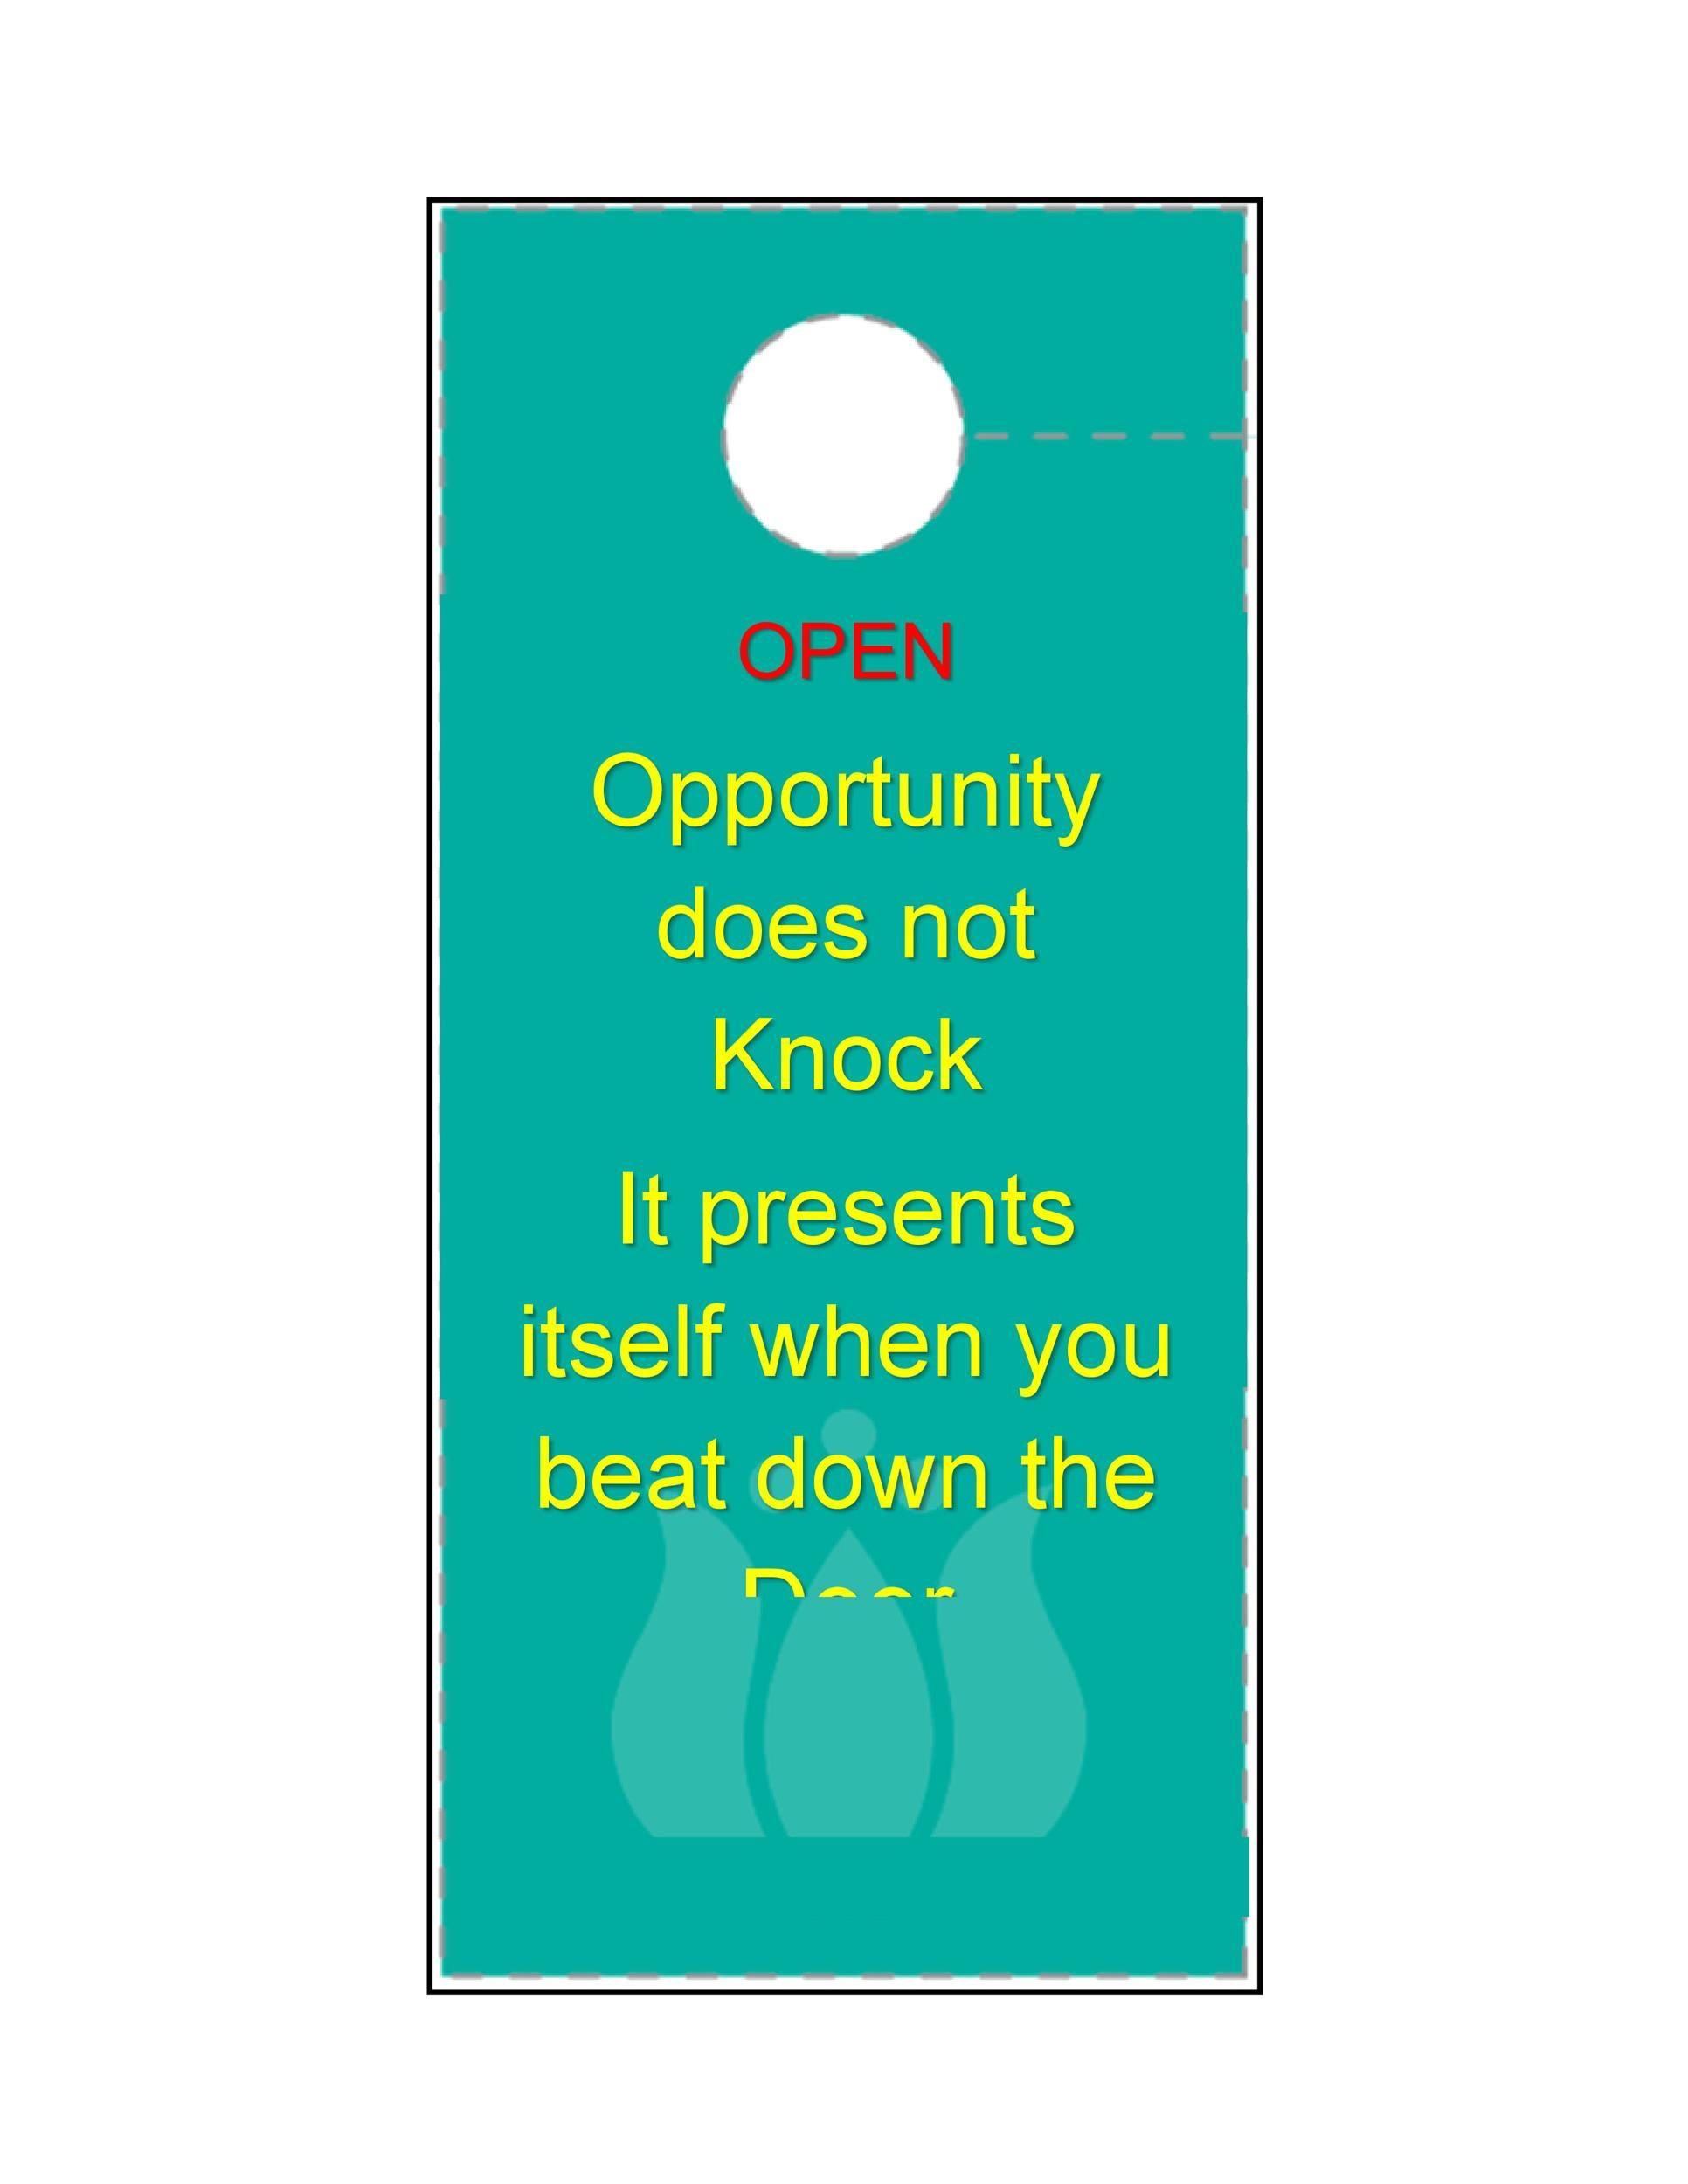 007 Fascinating Door Hanger Template For Word Design  Download Free Wedding MicrosoftFull